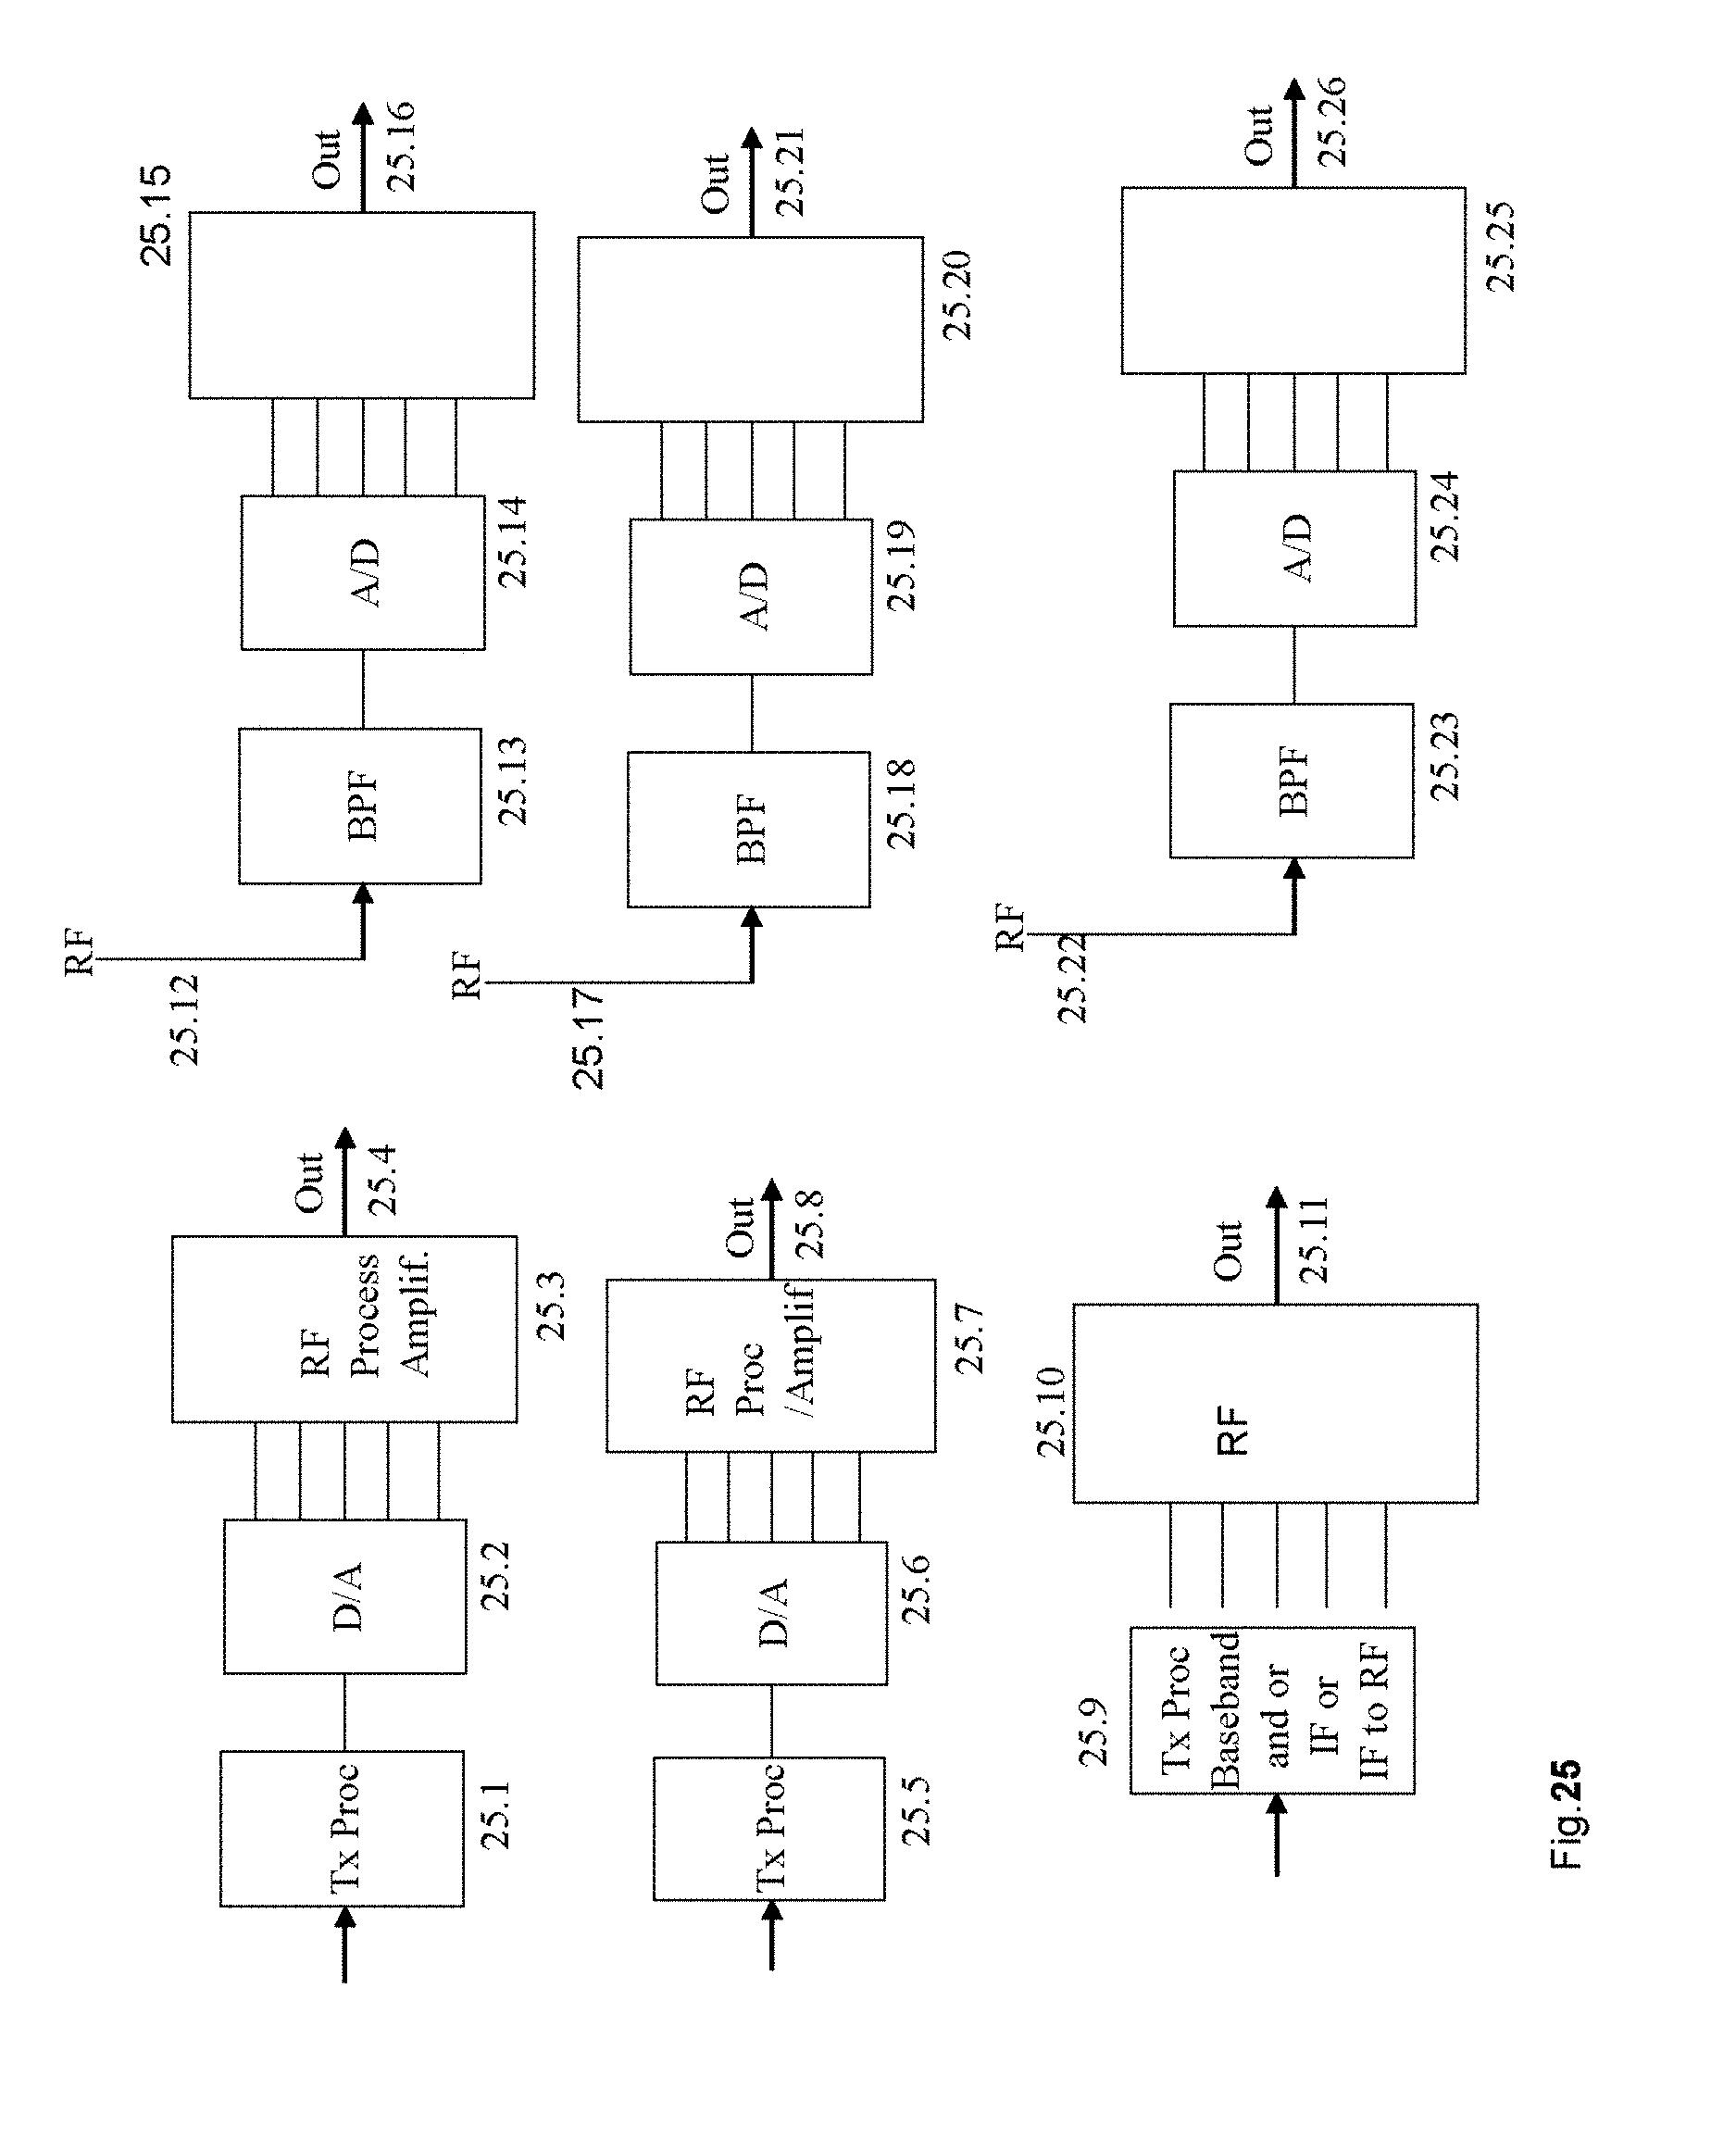 Patent US 9,755,693 B2